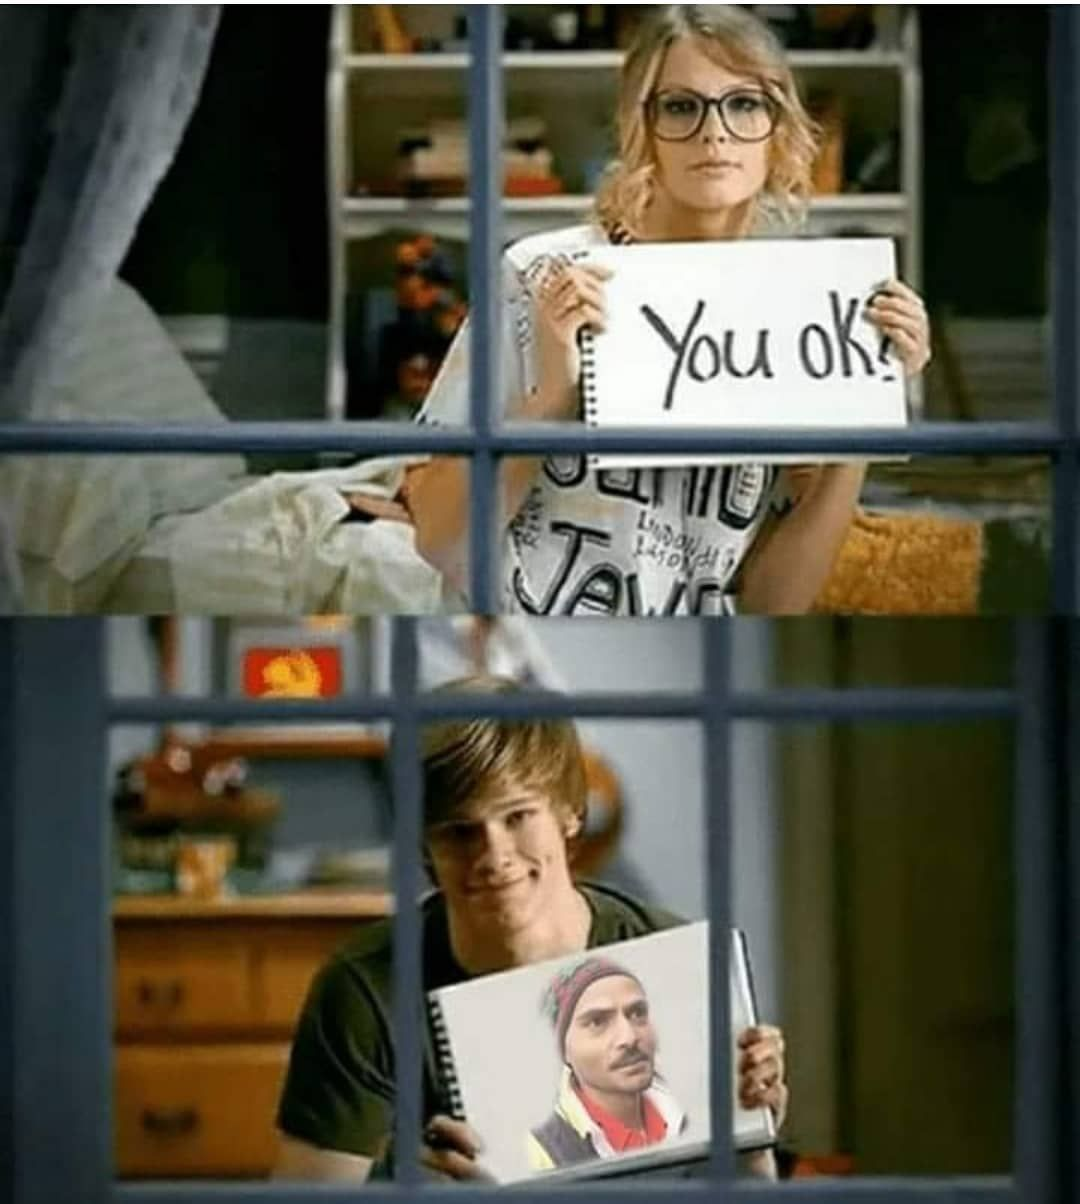 Smjha koi!!! 😆 #funnylaugh6#meme#memes#laugh#fun#funny# ...